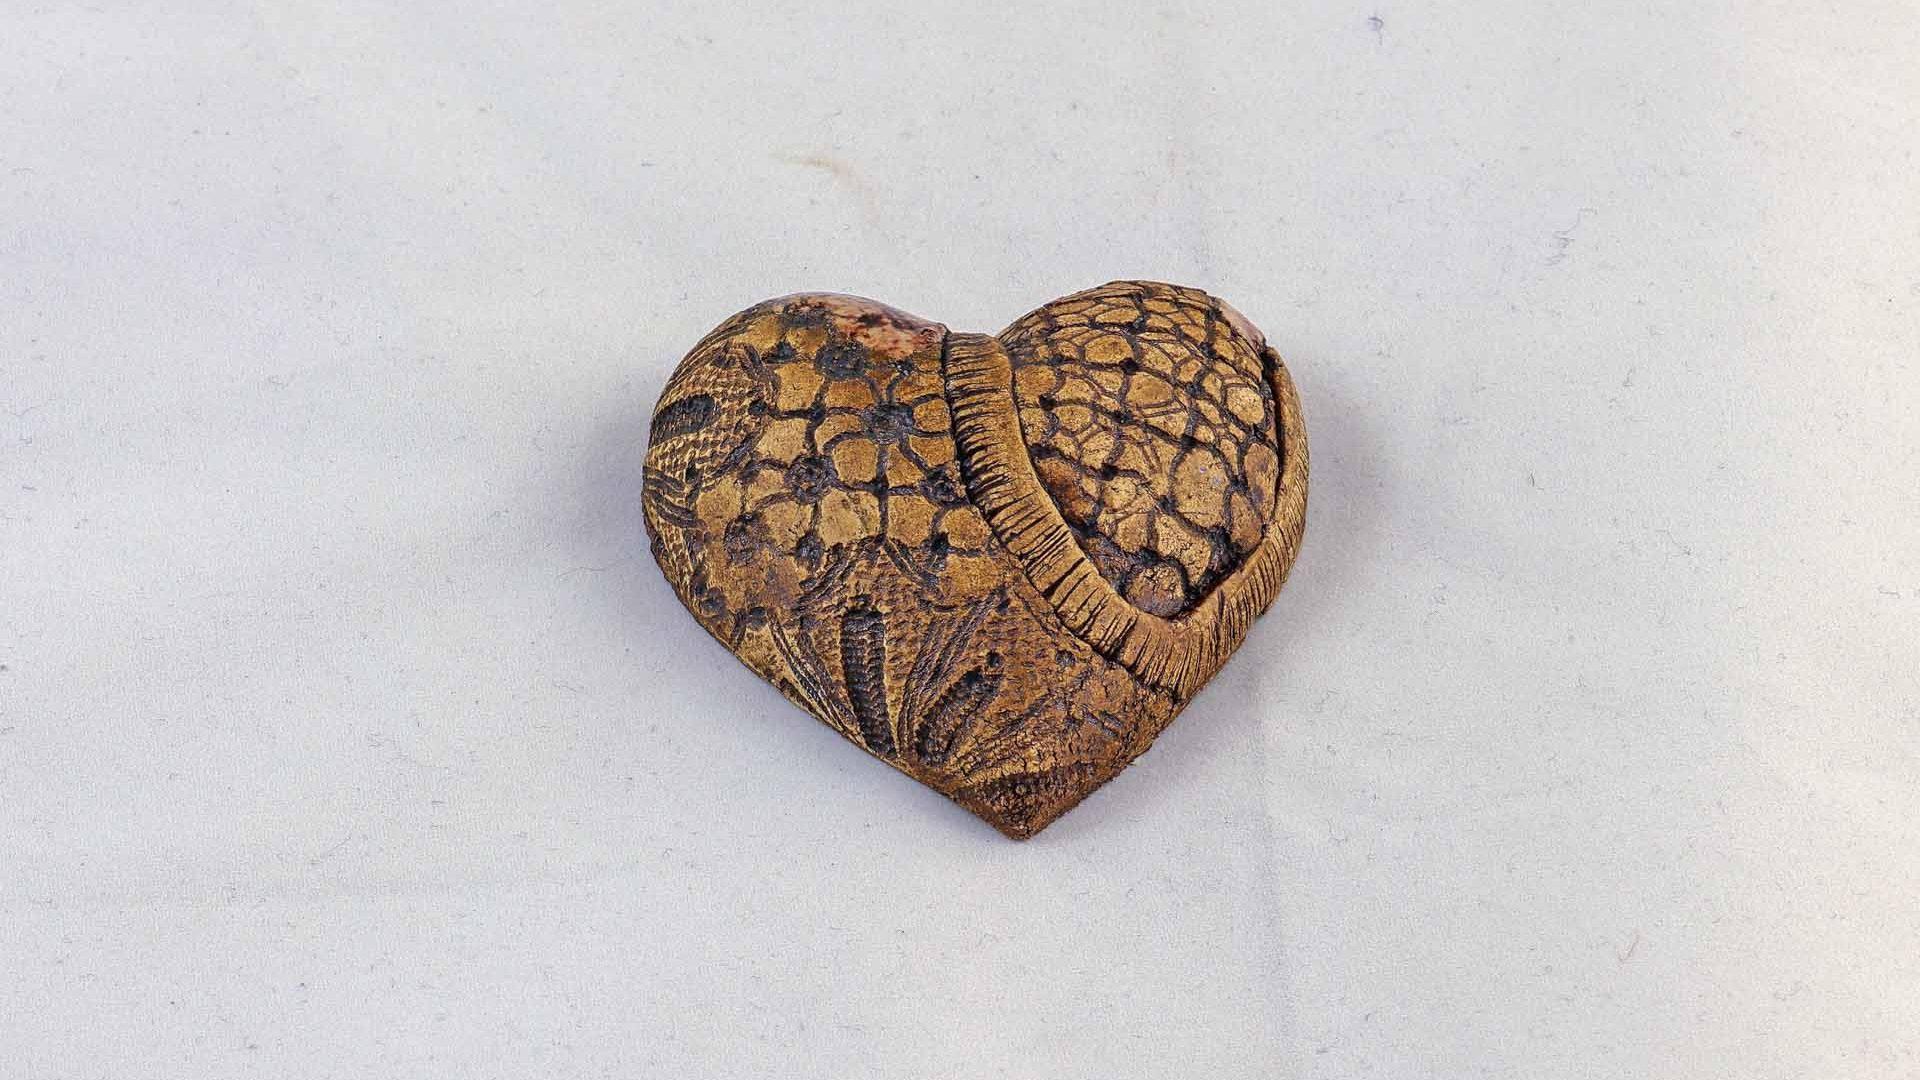 Petra Zobl Keramik - Herz Muster manganspinell